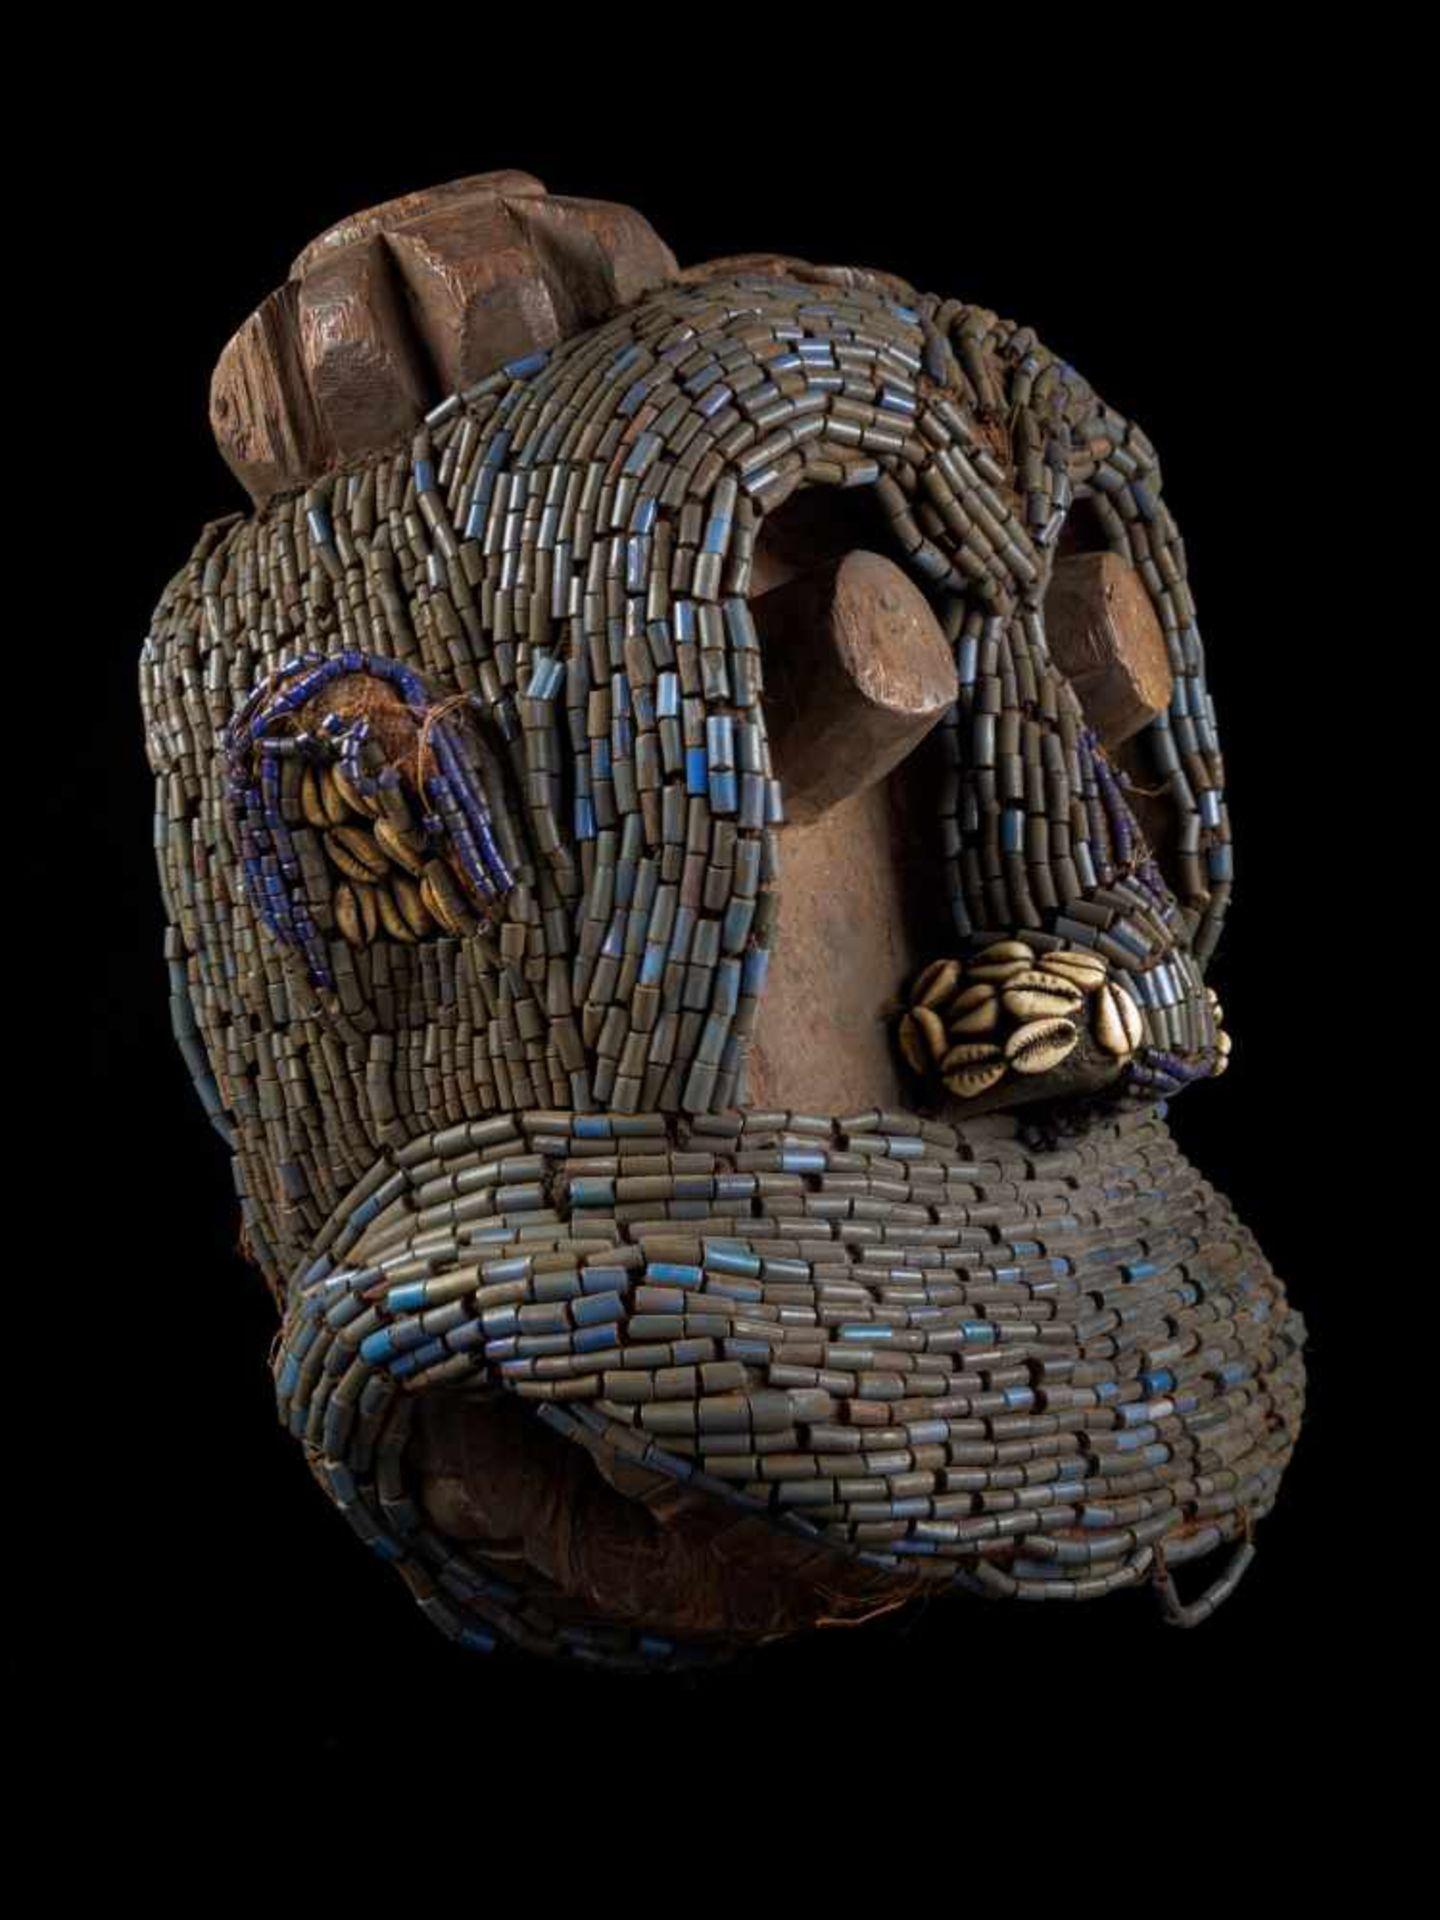 Beaded Gorilla Mask With Wooden Headdress - Tribal ArtA beautiful gorilla mask fashioned from wood - Bild 5 aus 7